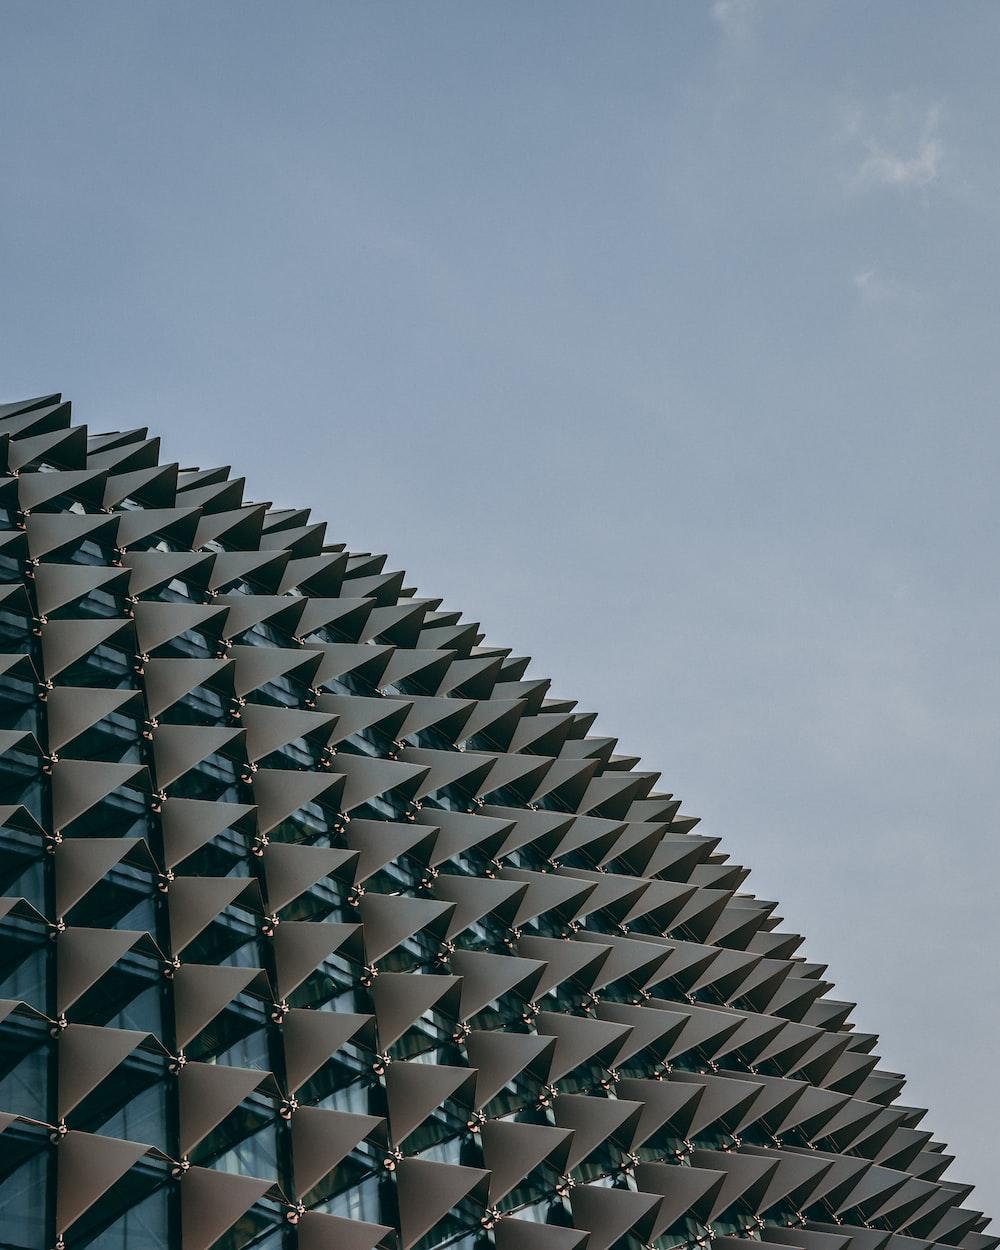 gray spiky building